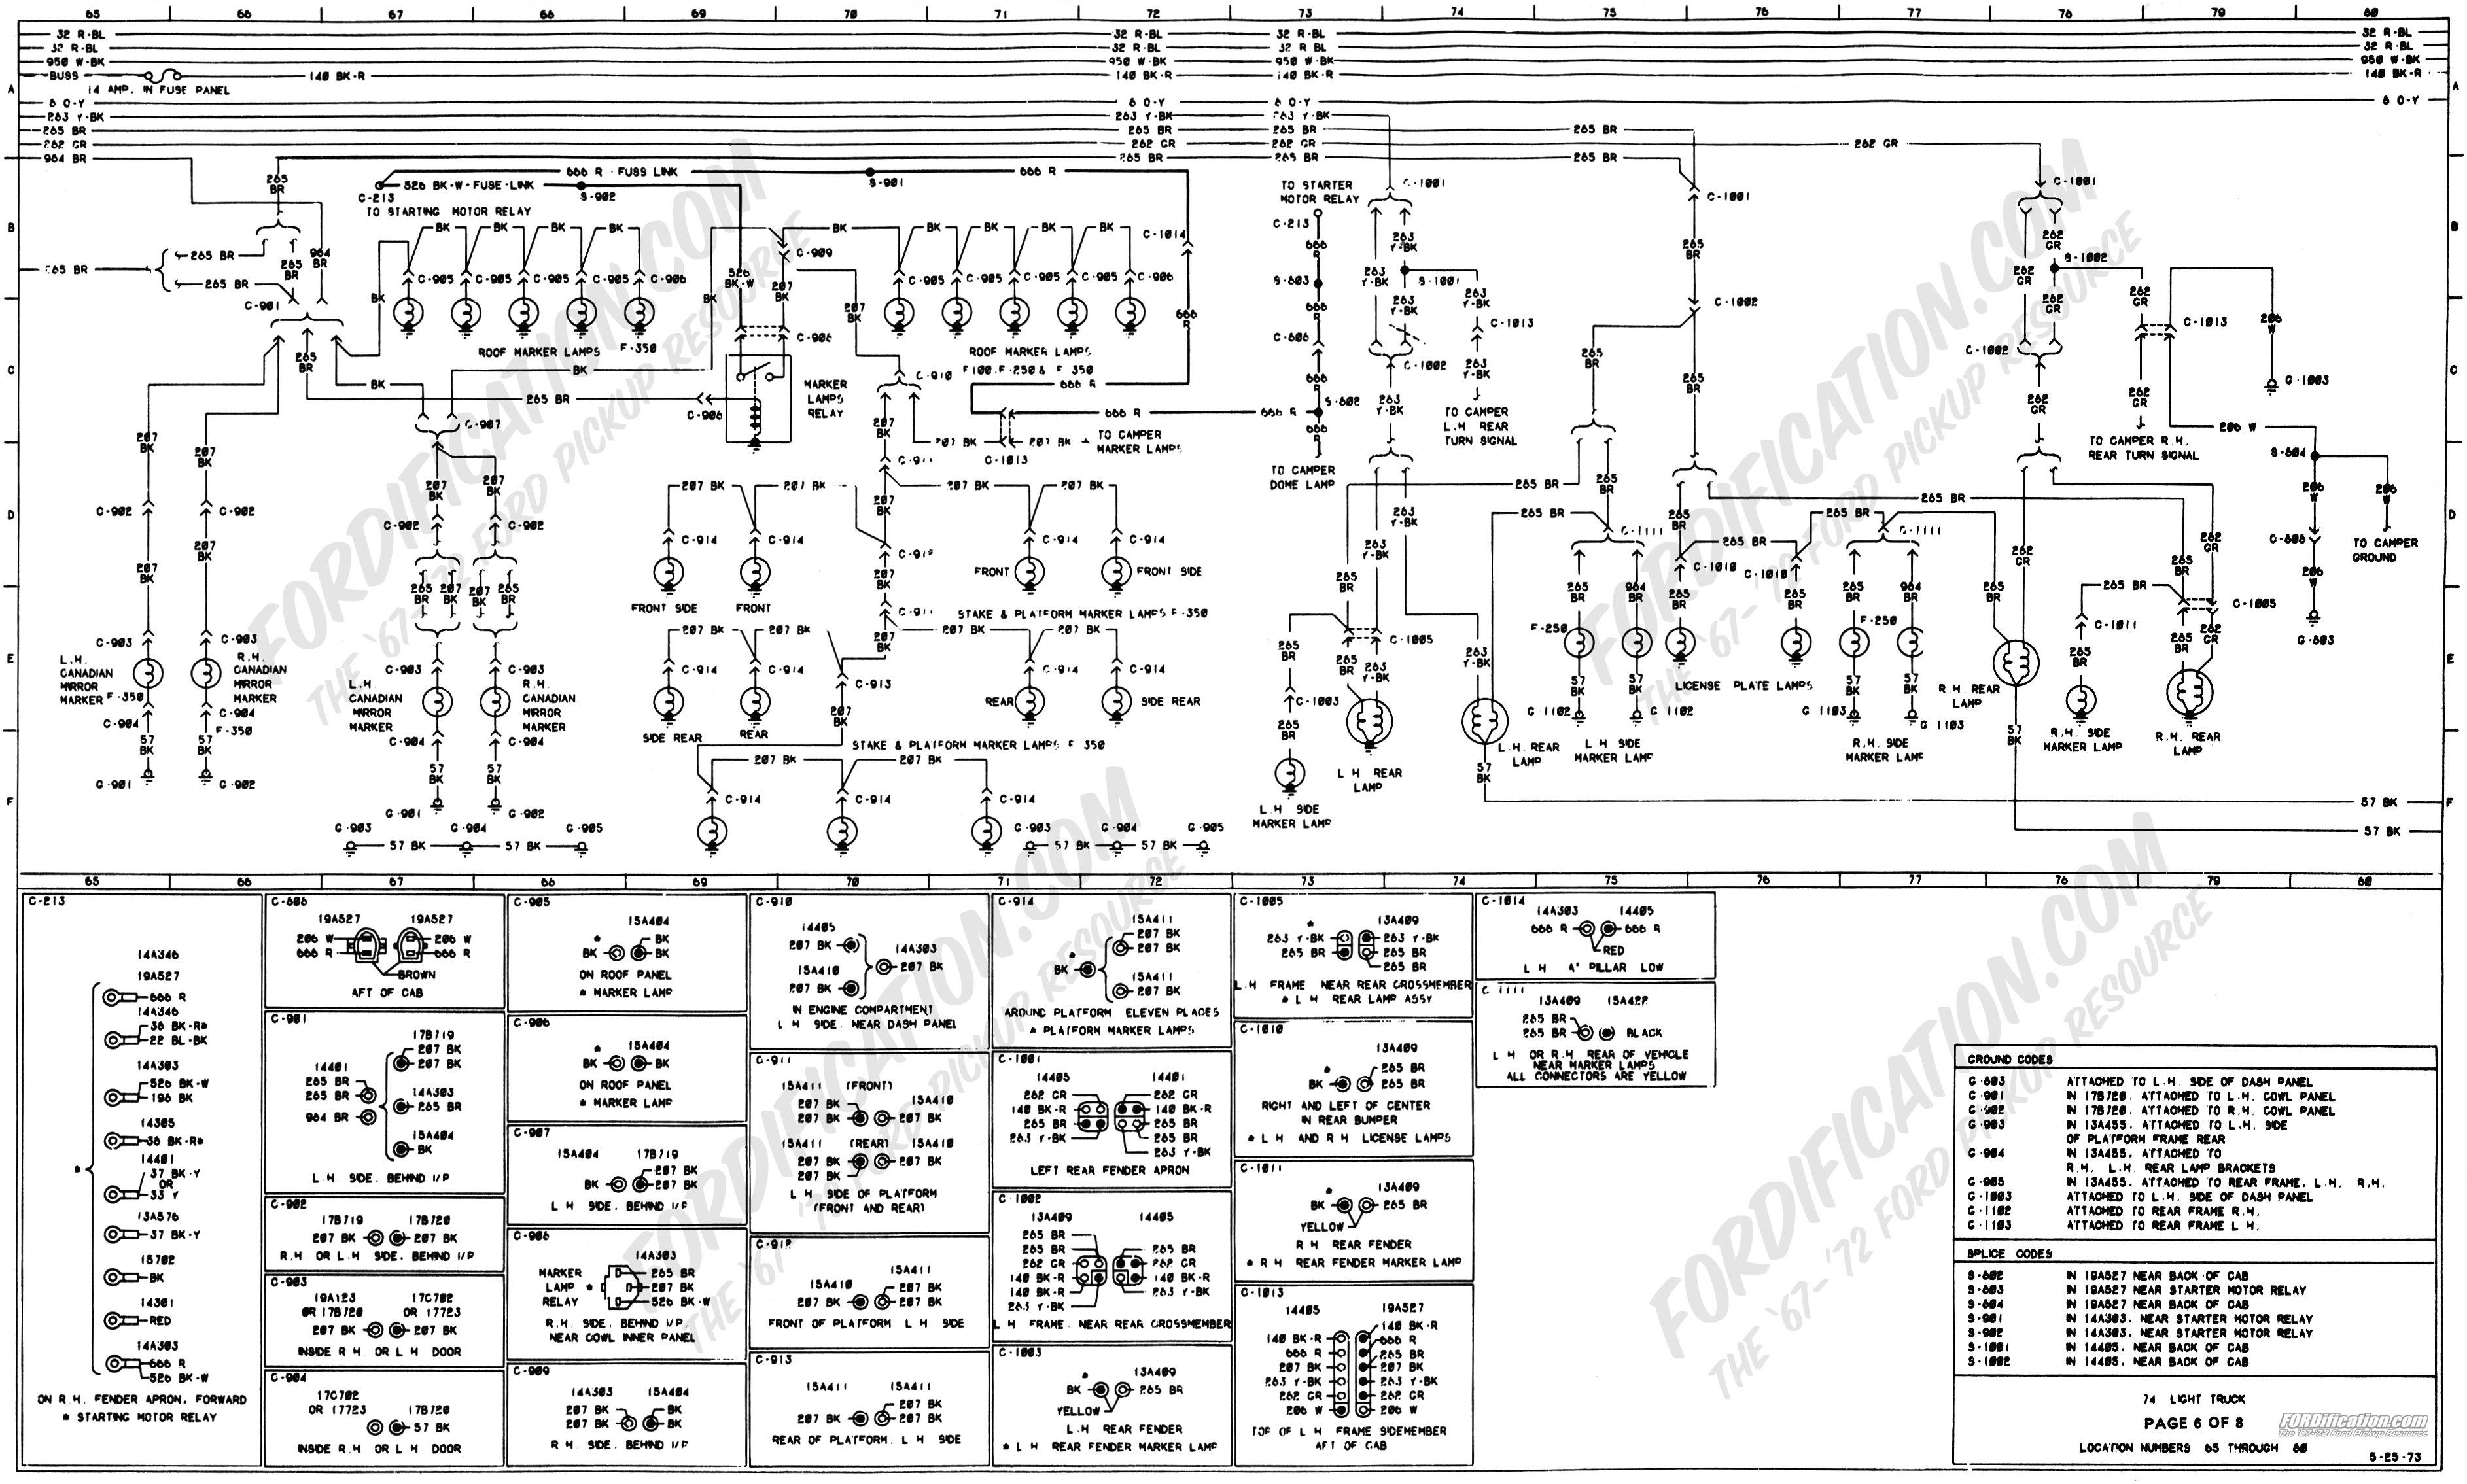 Awesome 1978 Ford Pickup Wiring Diagram Wiring Diagram Libraries Wiring Cloud Orsalboapumohammedshrineorg